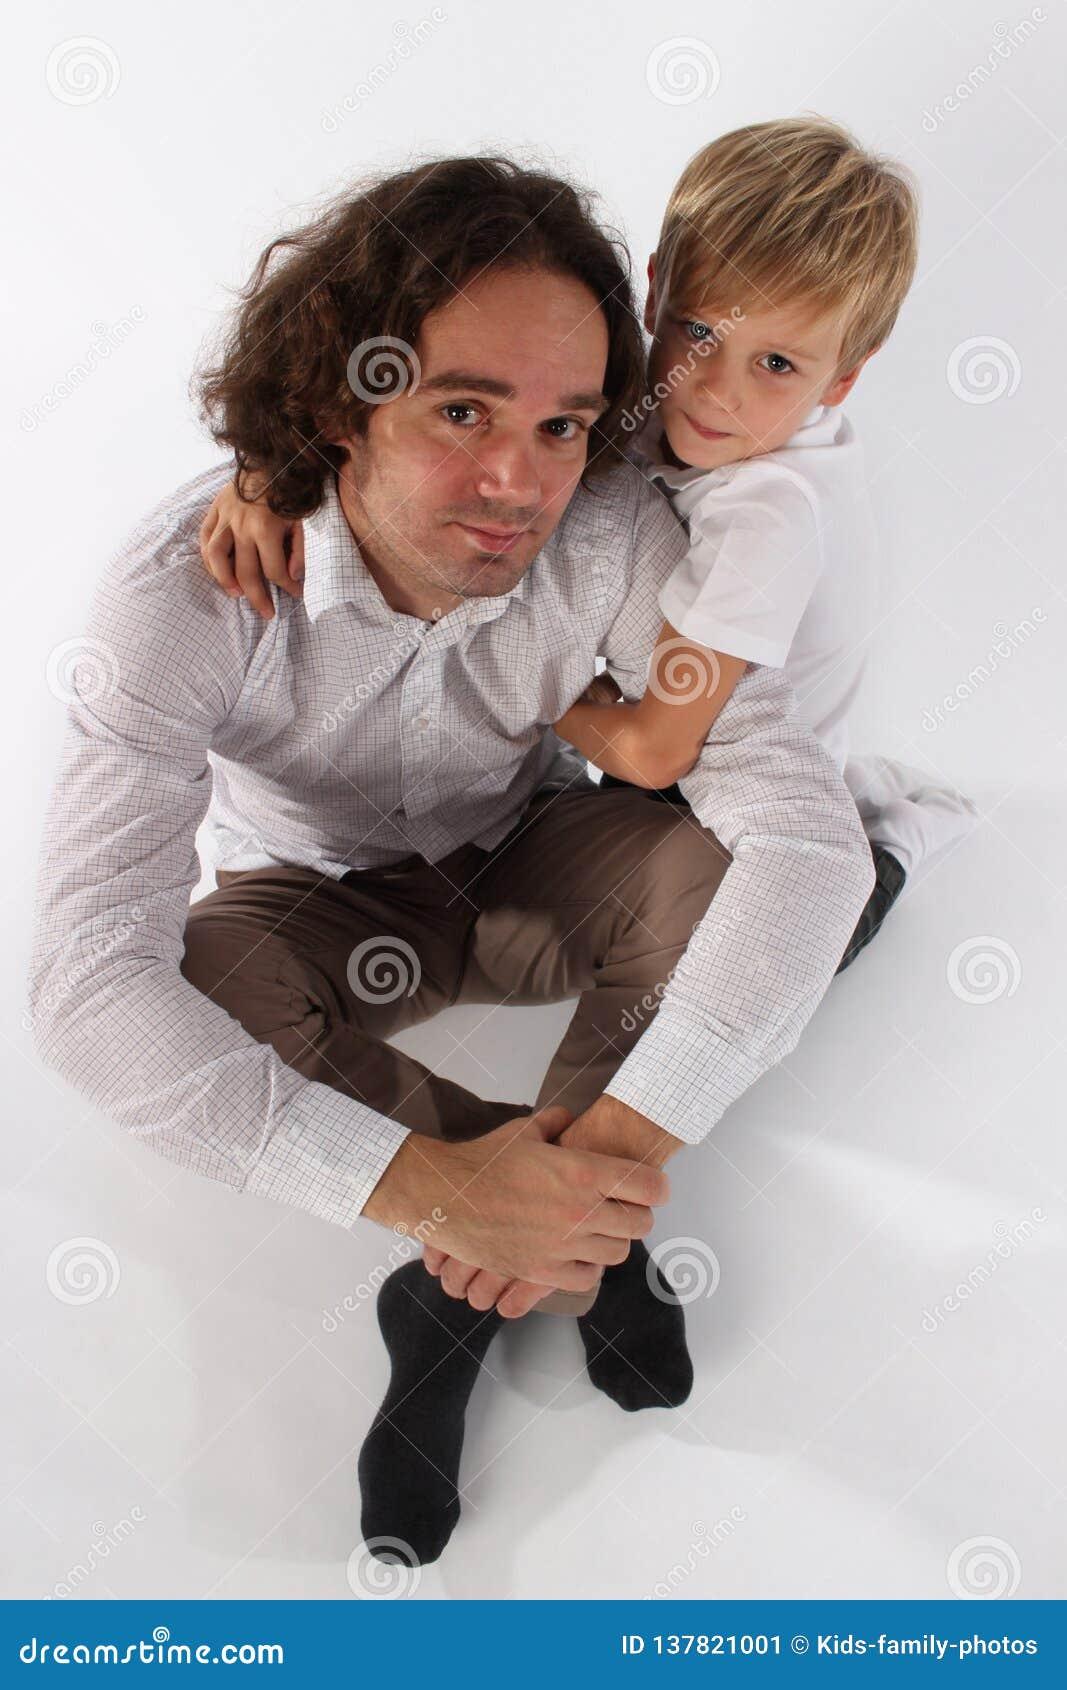 A pretty fair hair child boy hugging his daddy